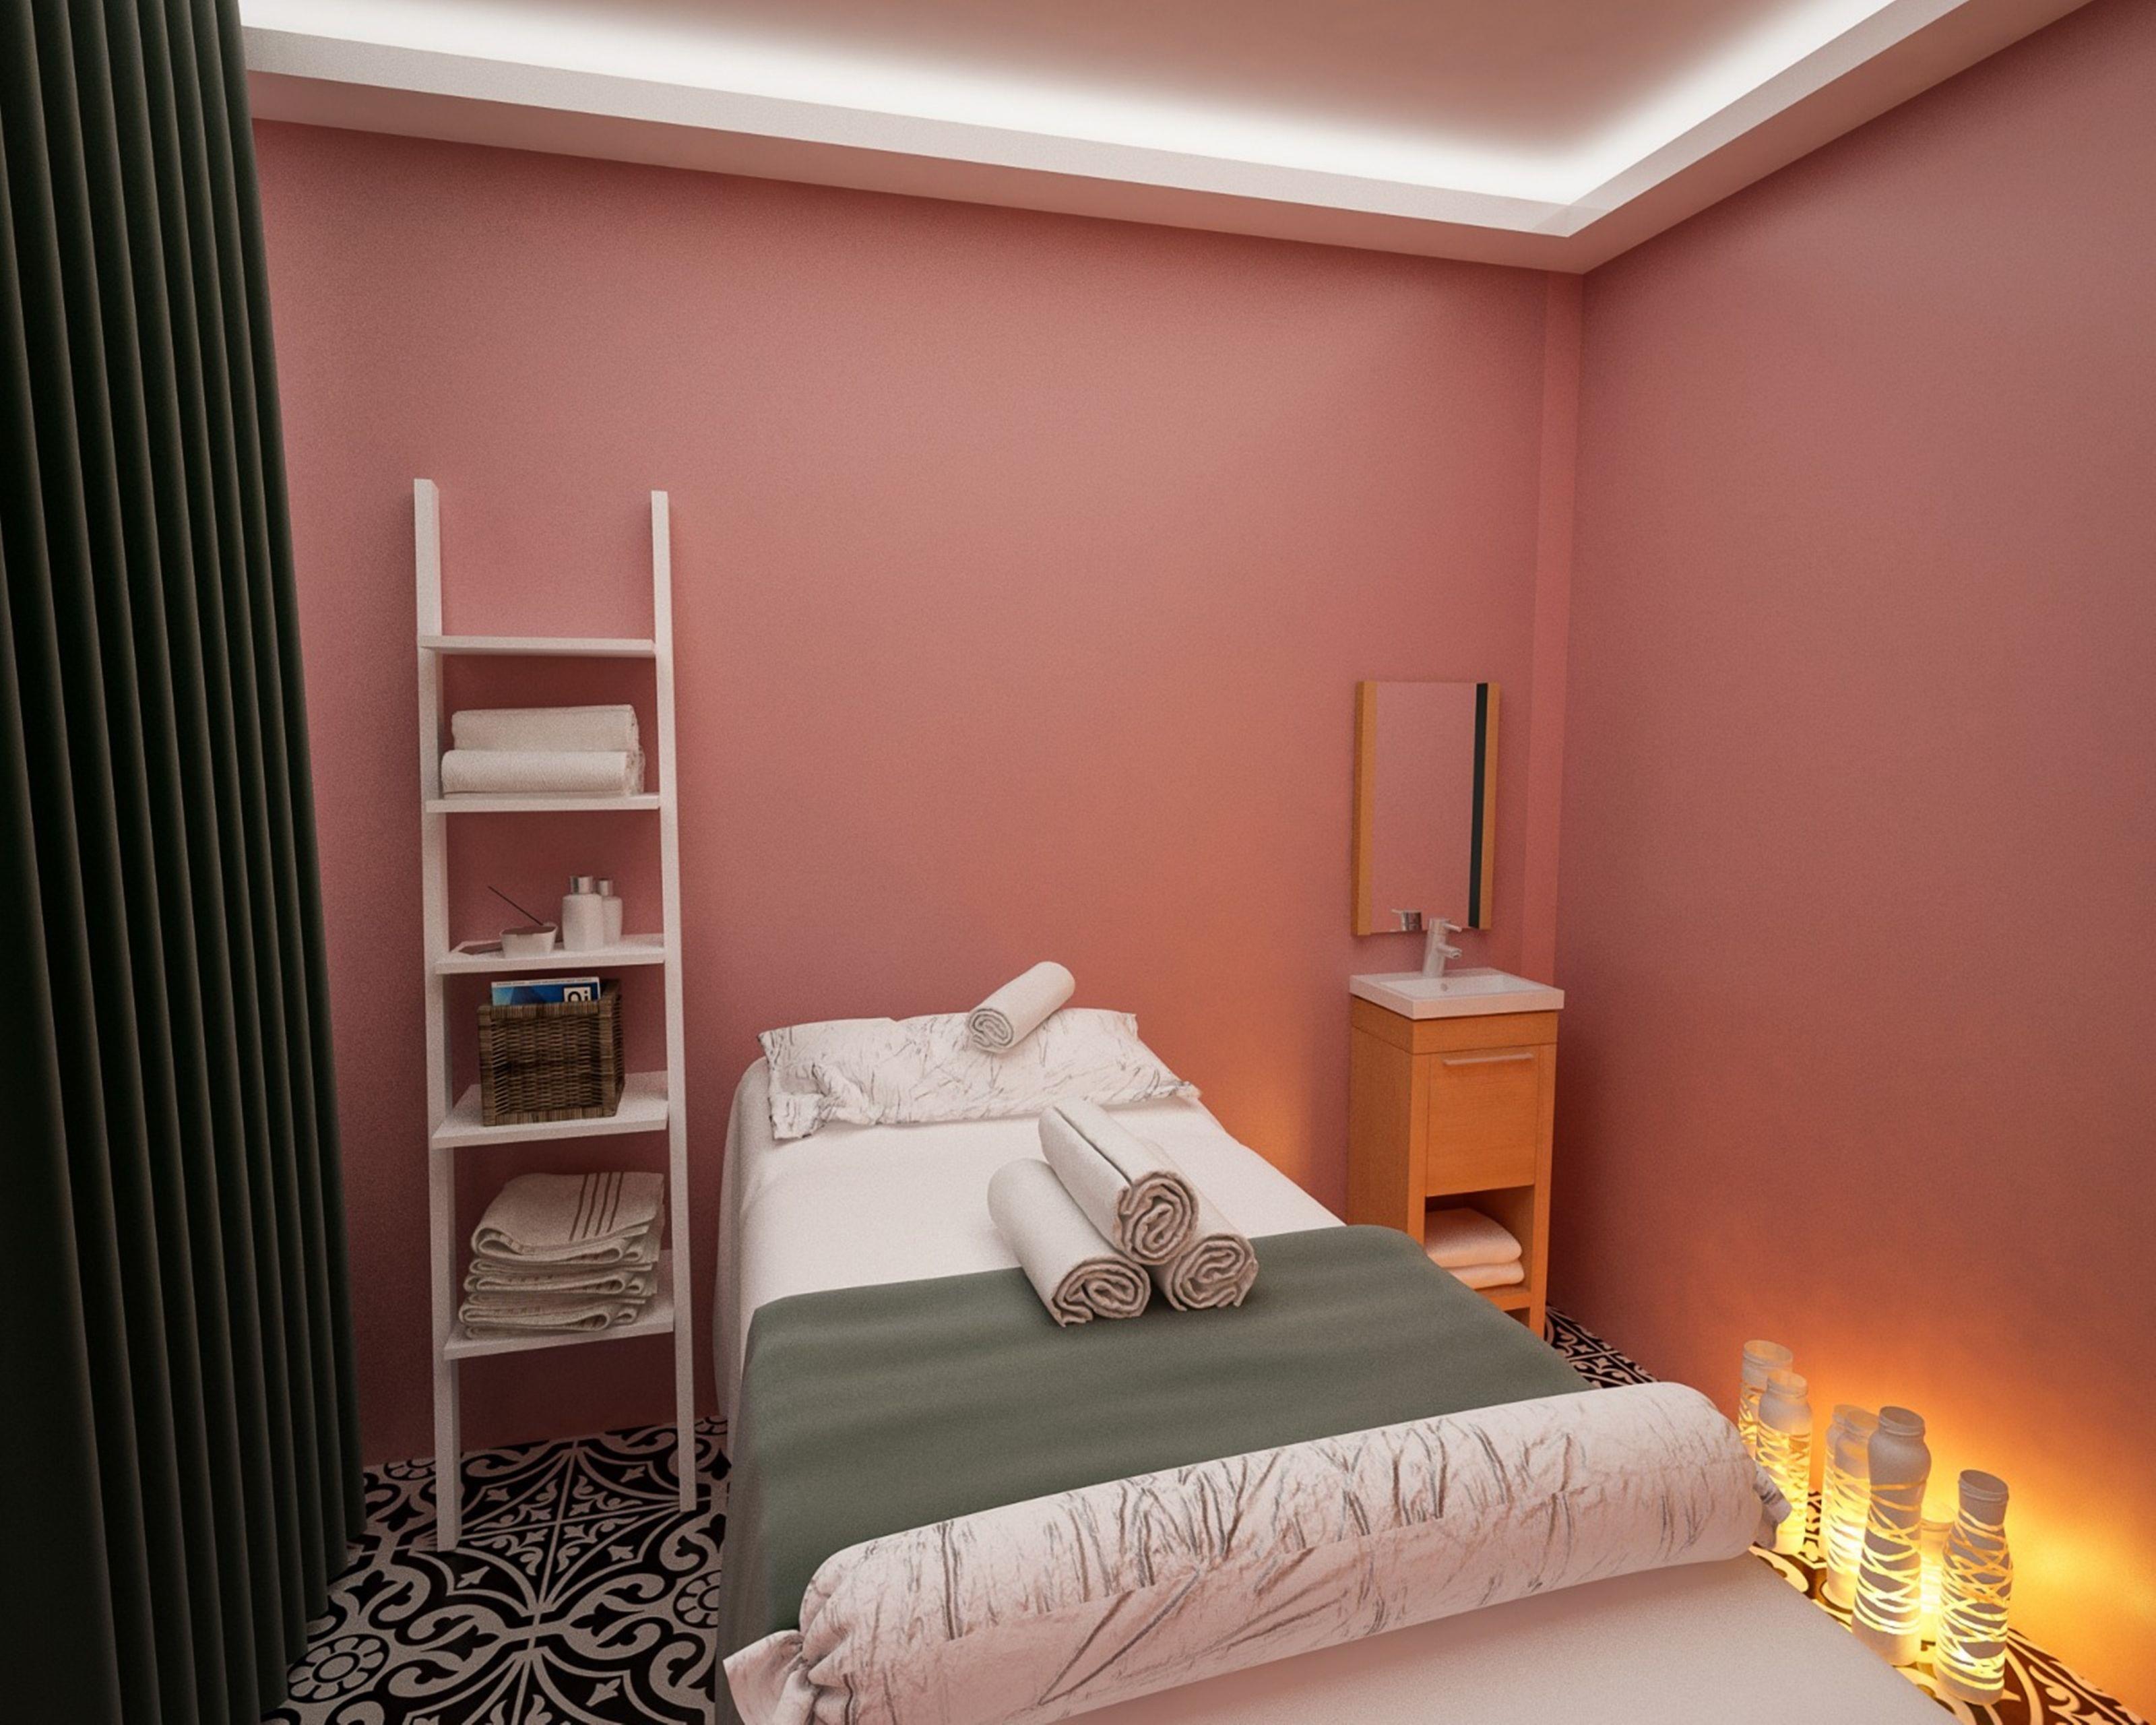 http://www.orextravel.sk/OREX/hotelphotos/anjeliq-downtown-hotel-general-0031.jpg